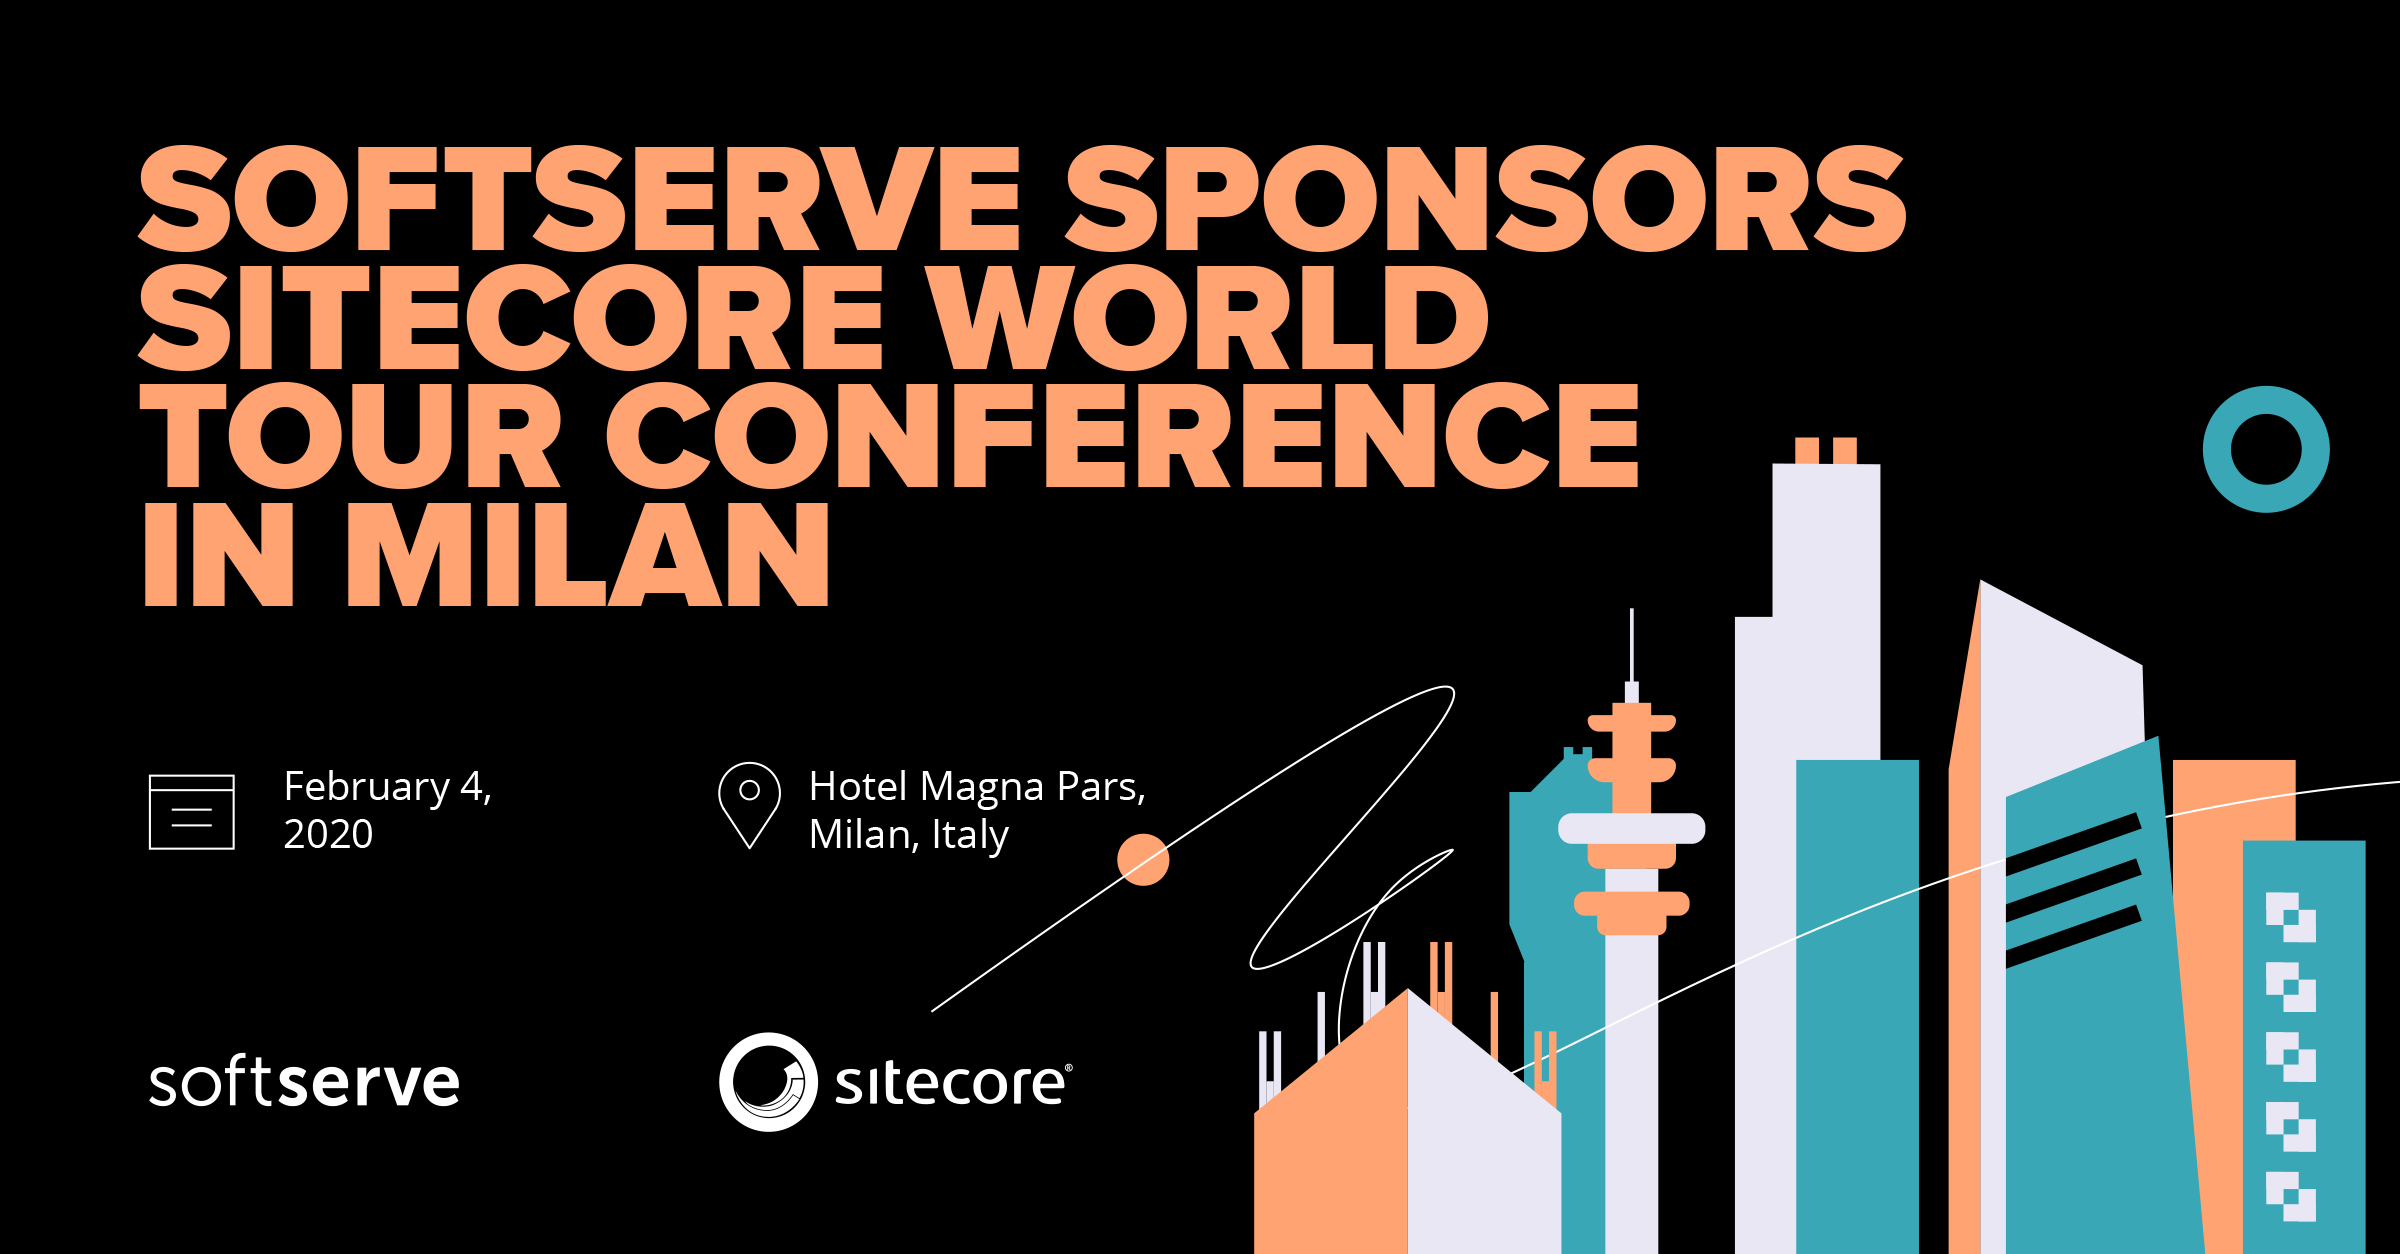 softserve-at-sitecore-worldtour-2020